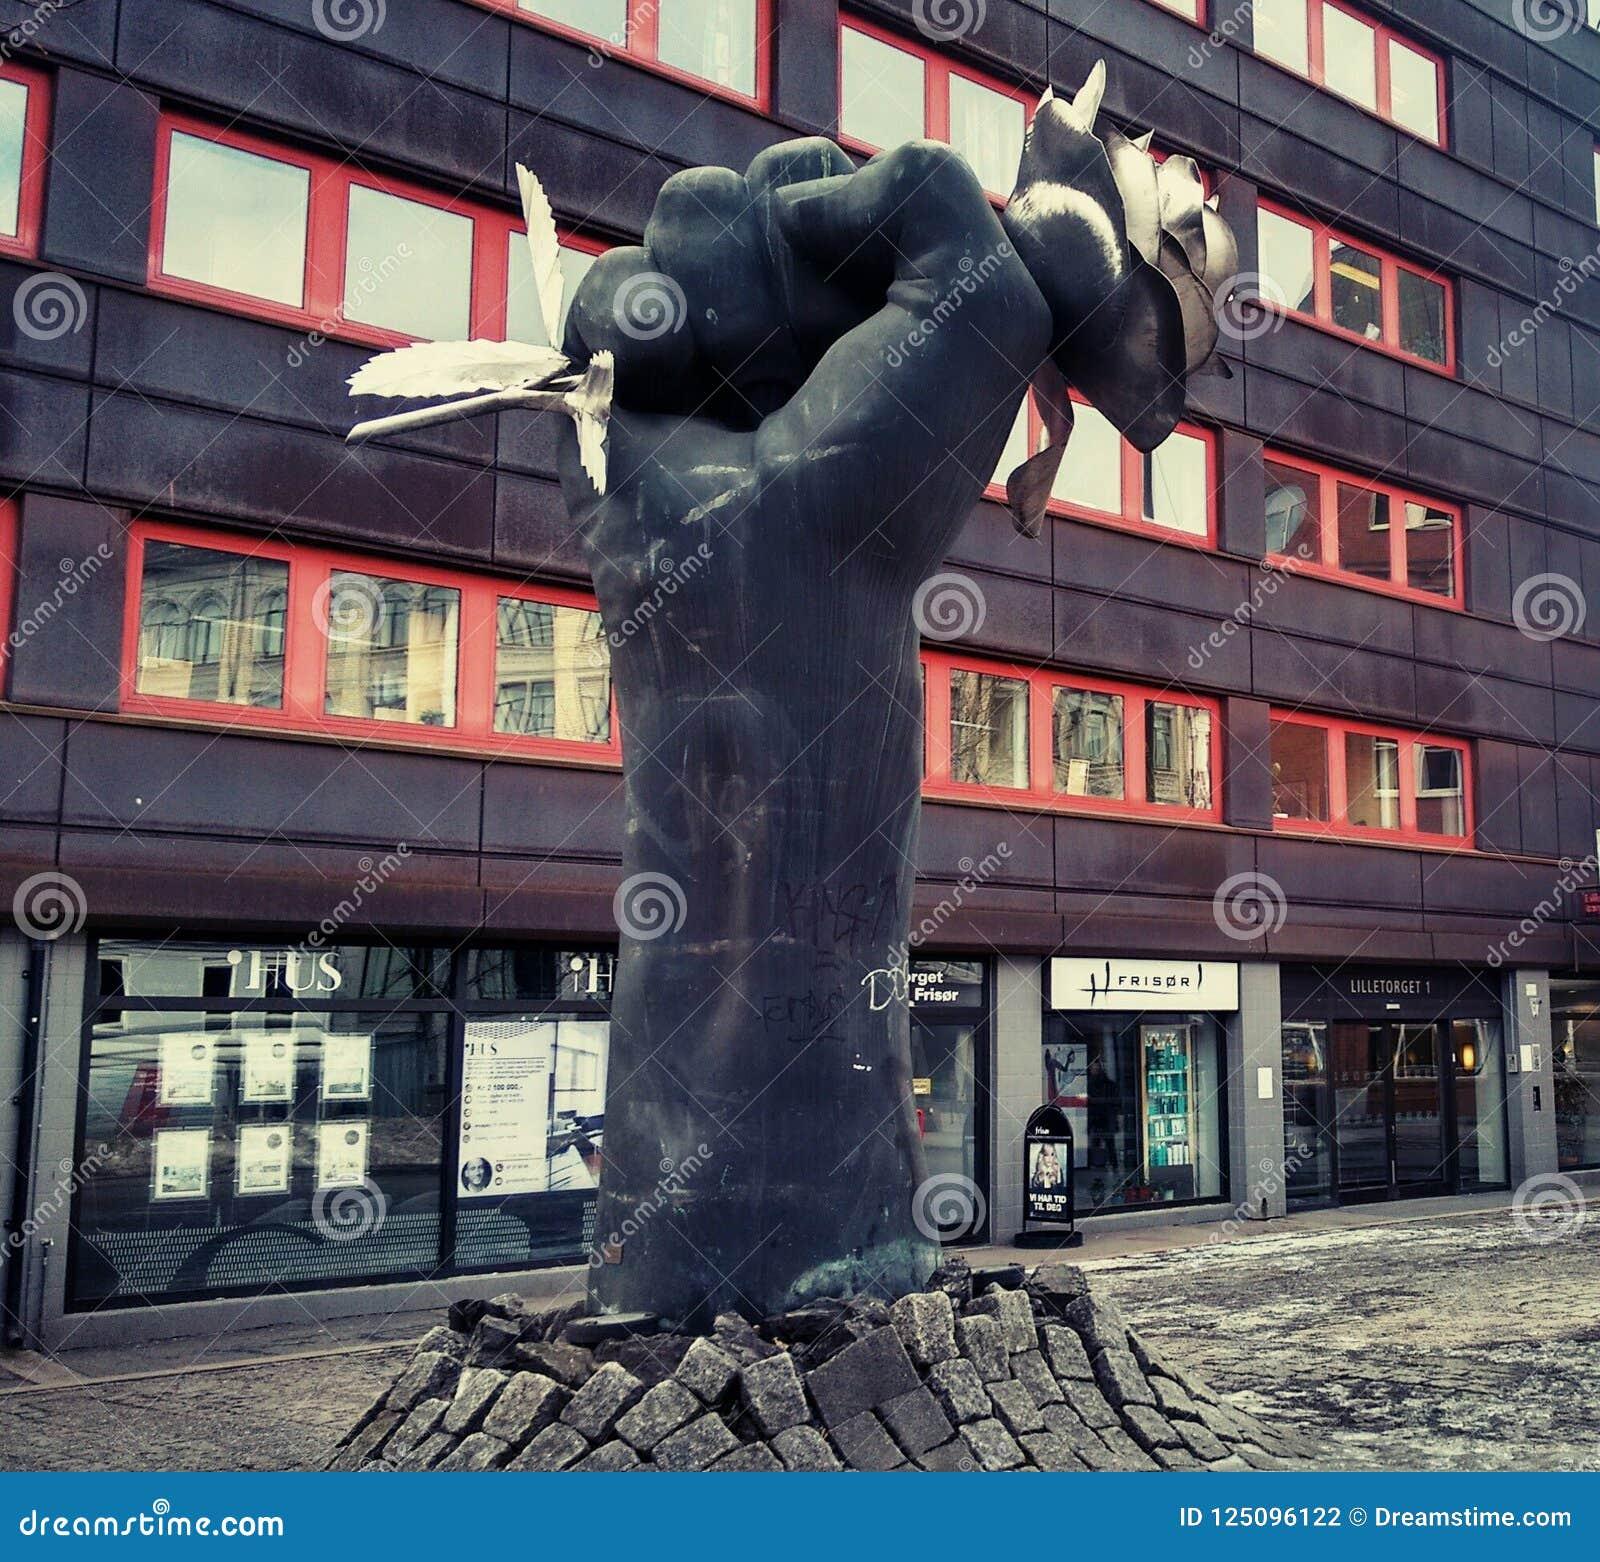 Street_art_Sculpture_The rose_Oslo_2018